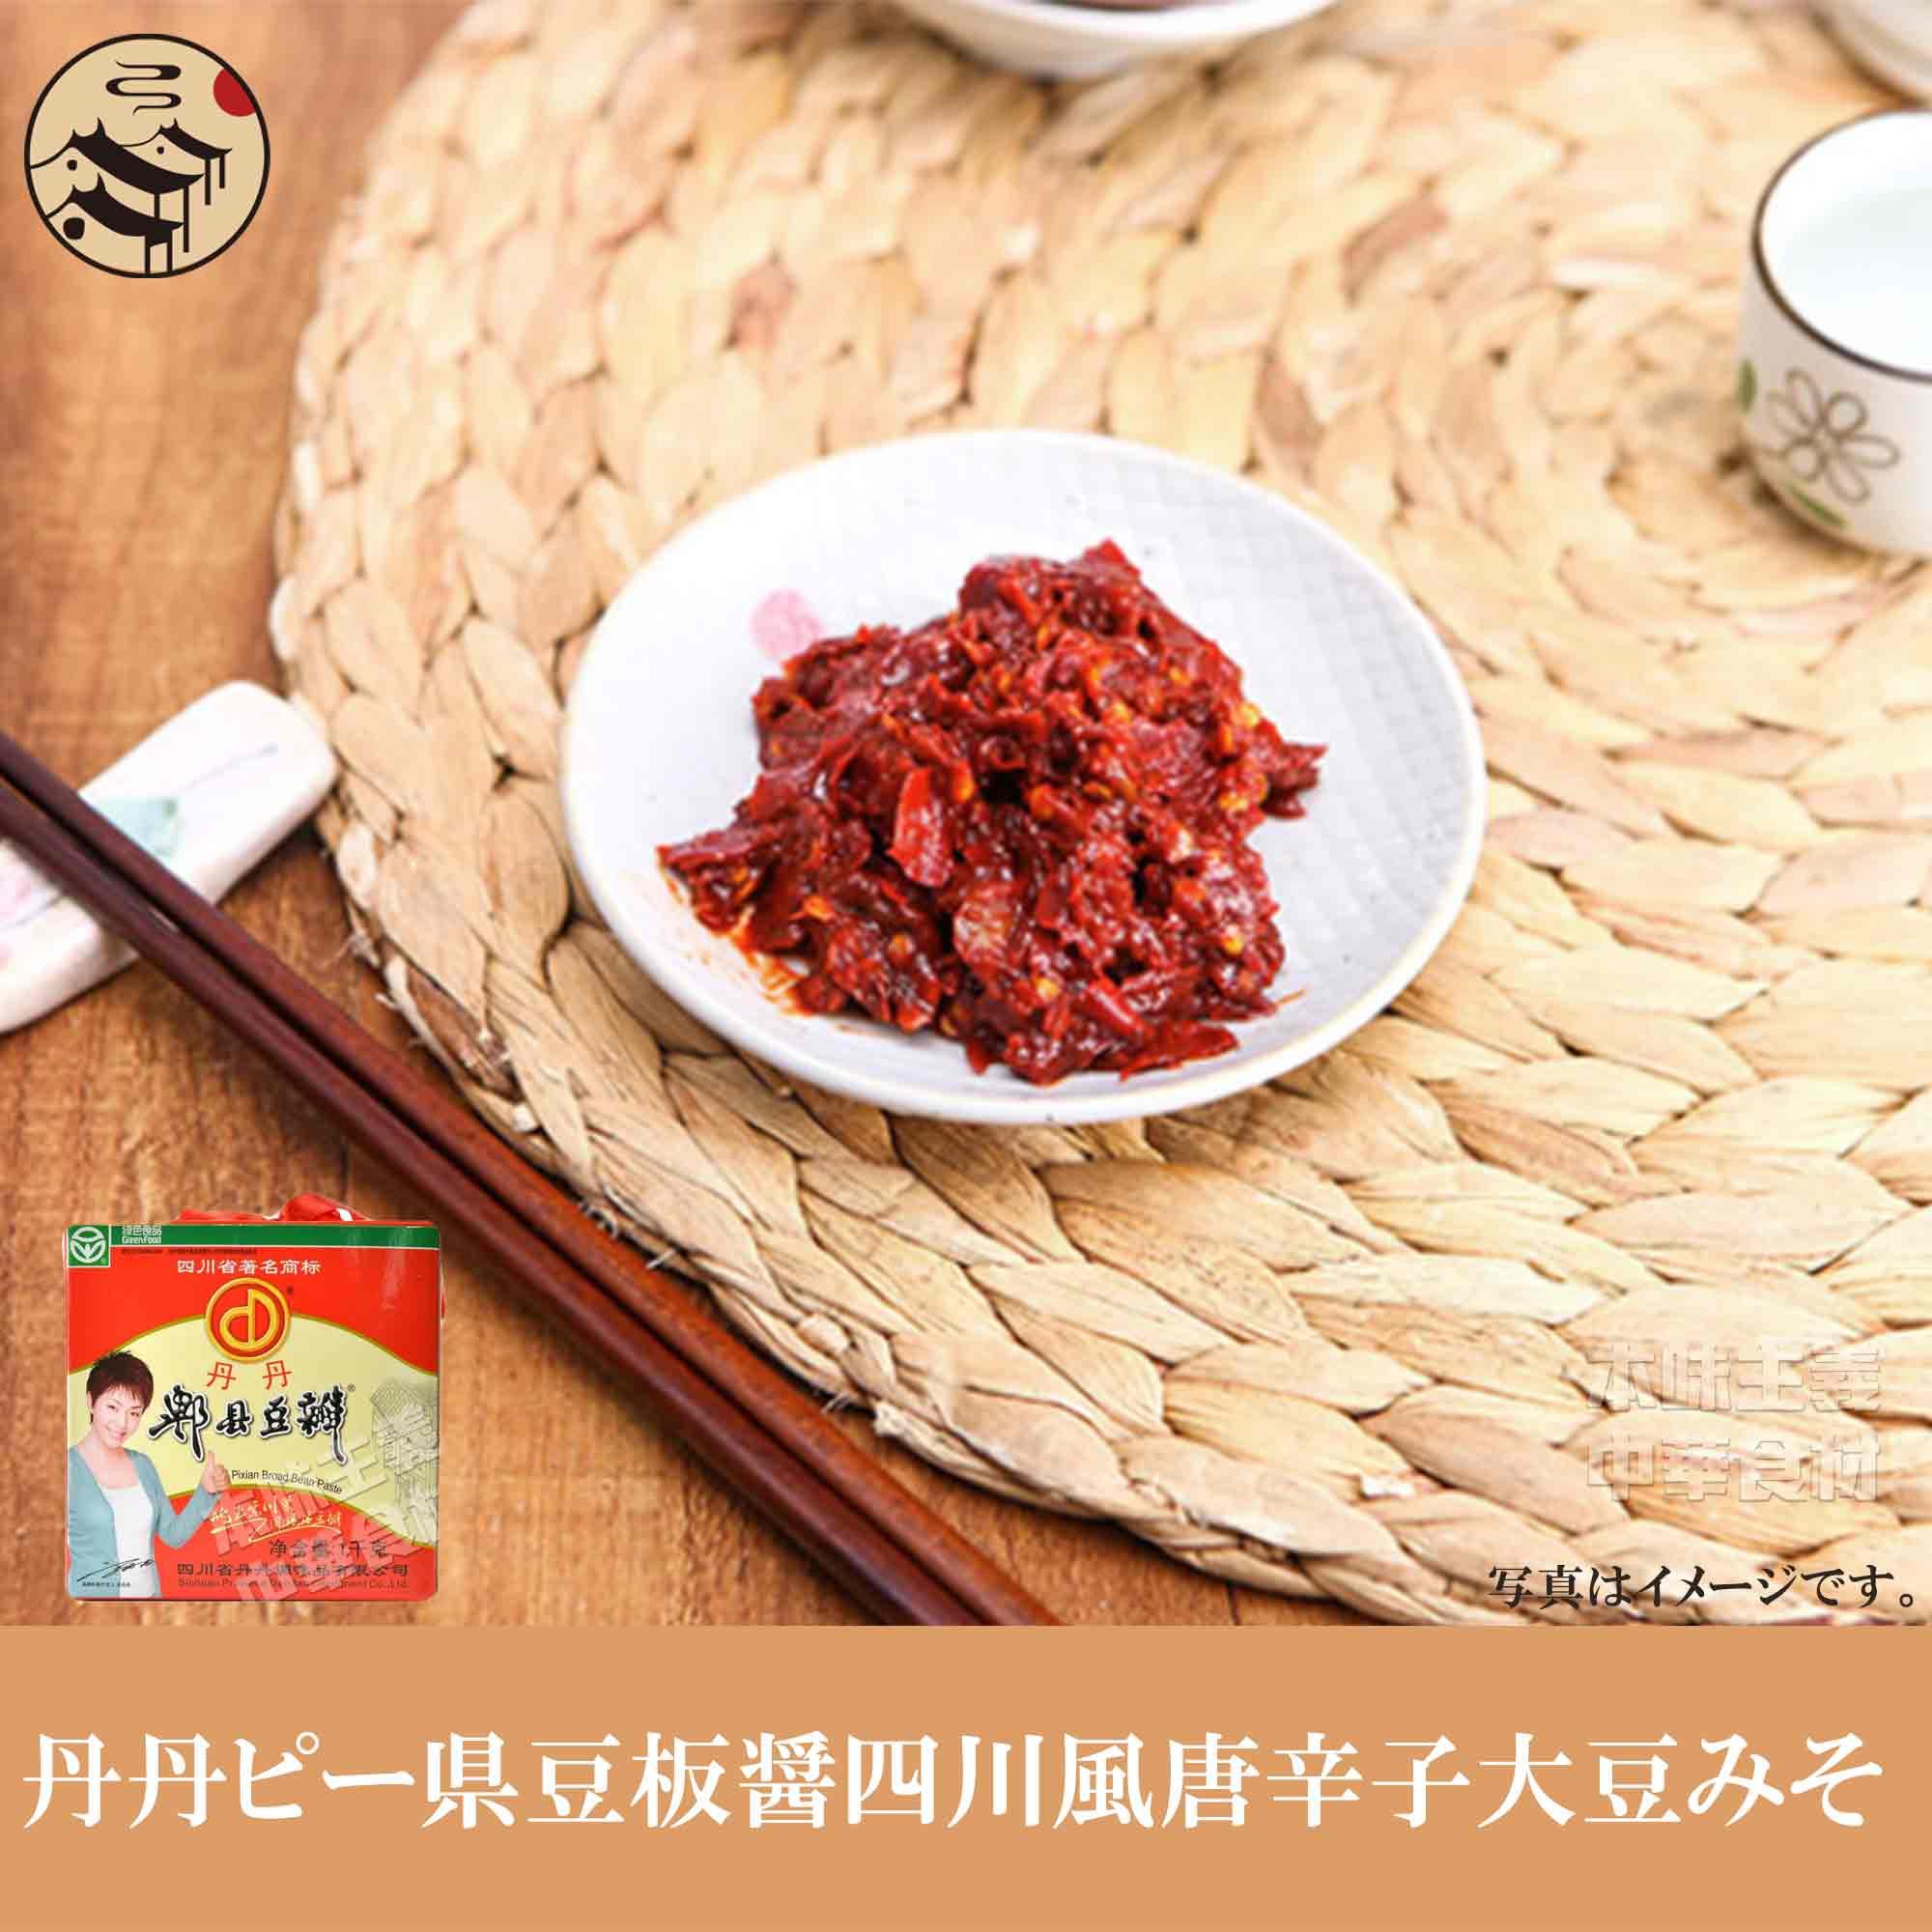 送料無料新品 丹丹ピー県豆板醤 特売 四川風唐辛子大豆みそ 1kg